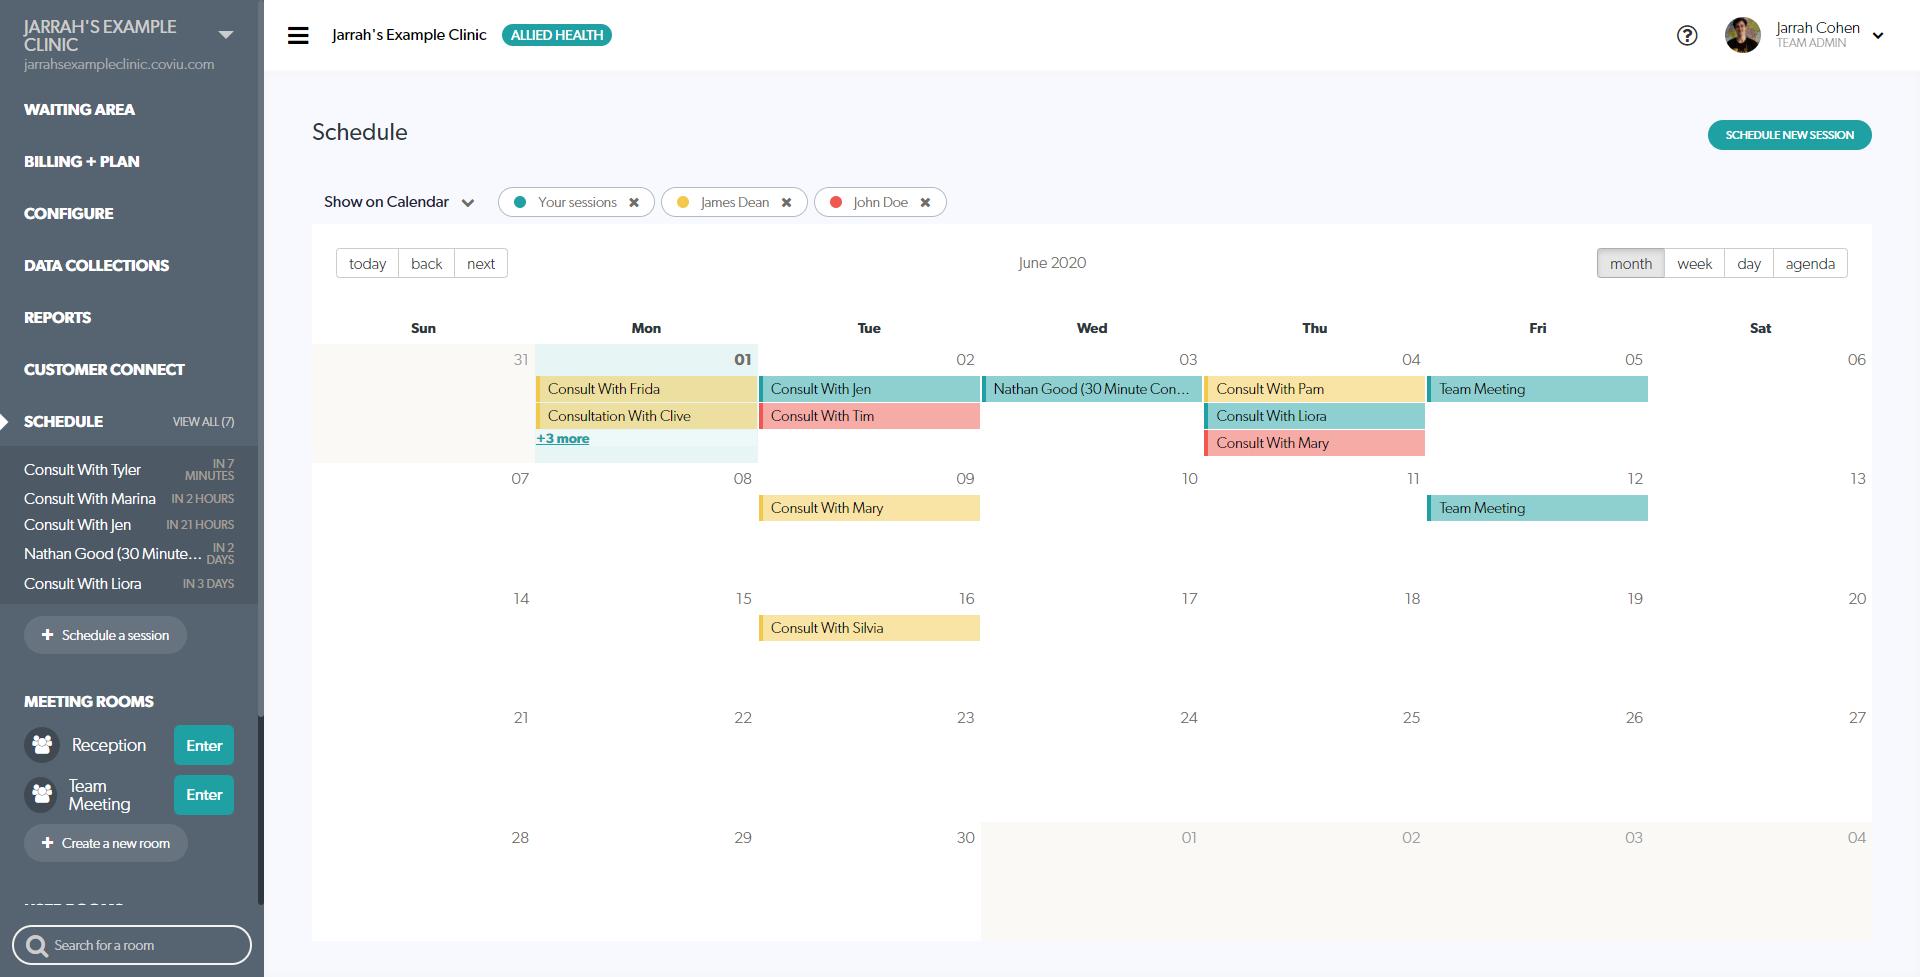 Calendar Appoitments View